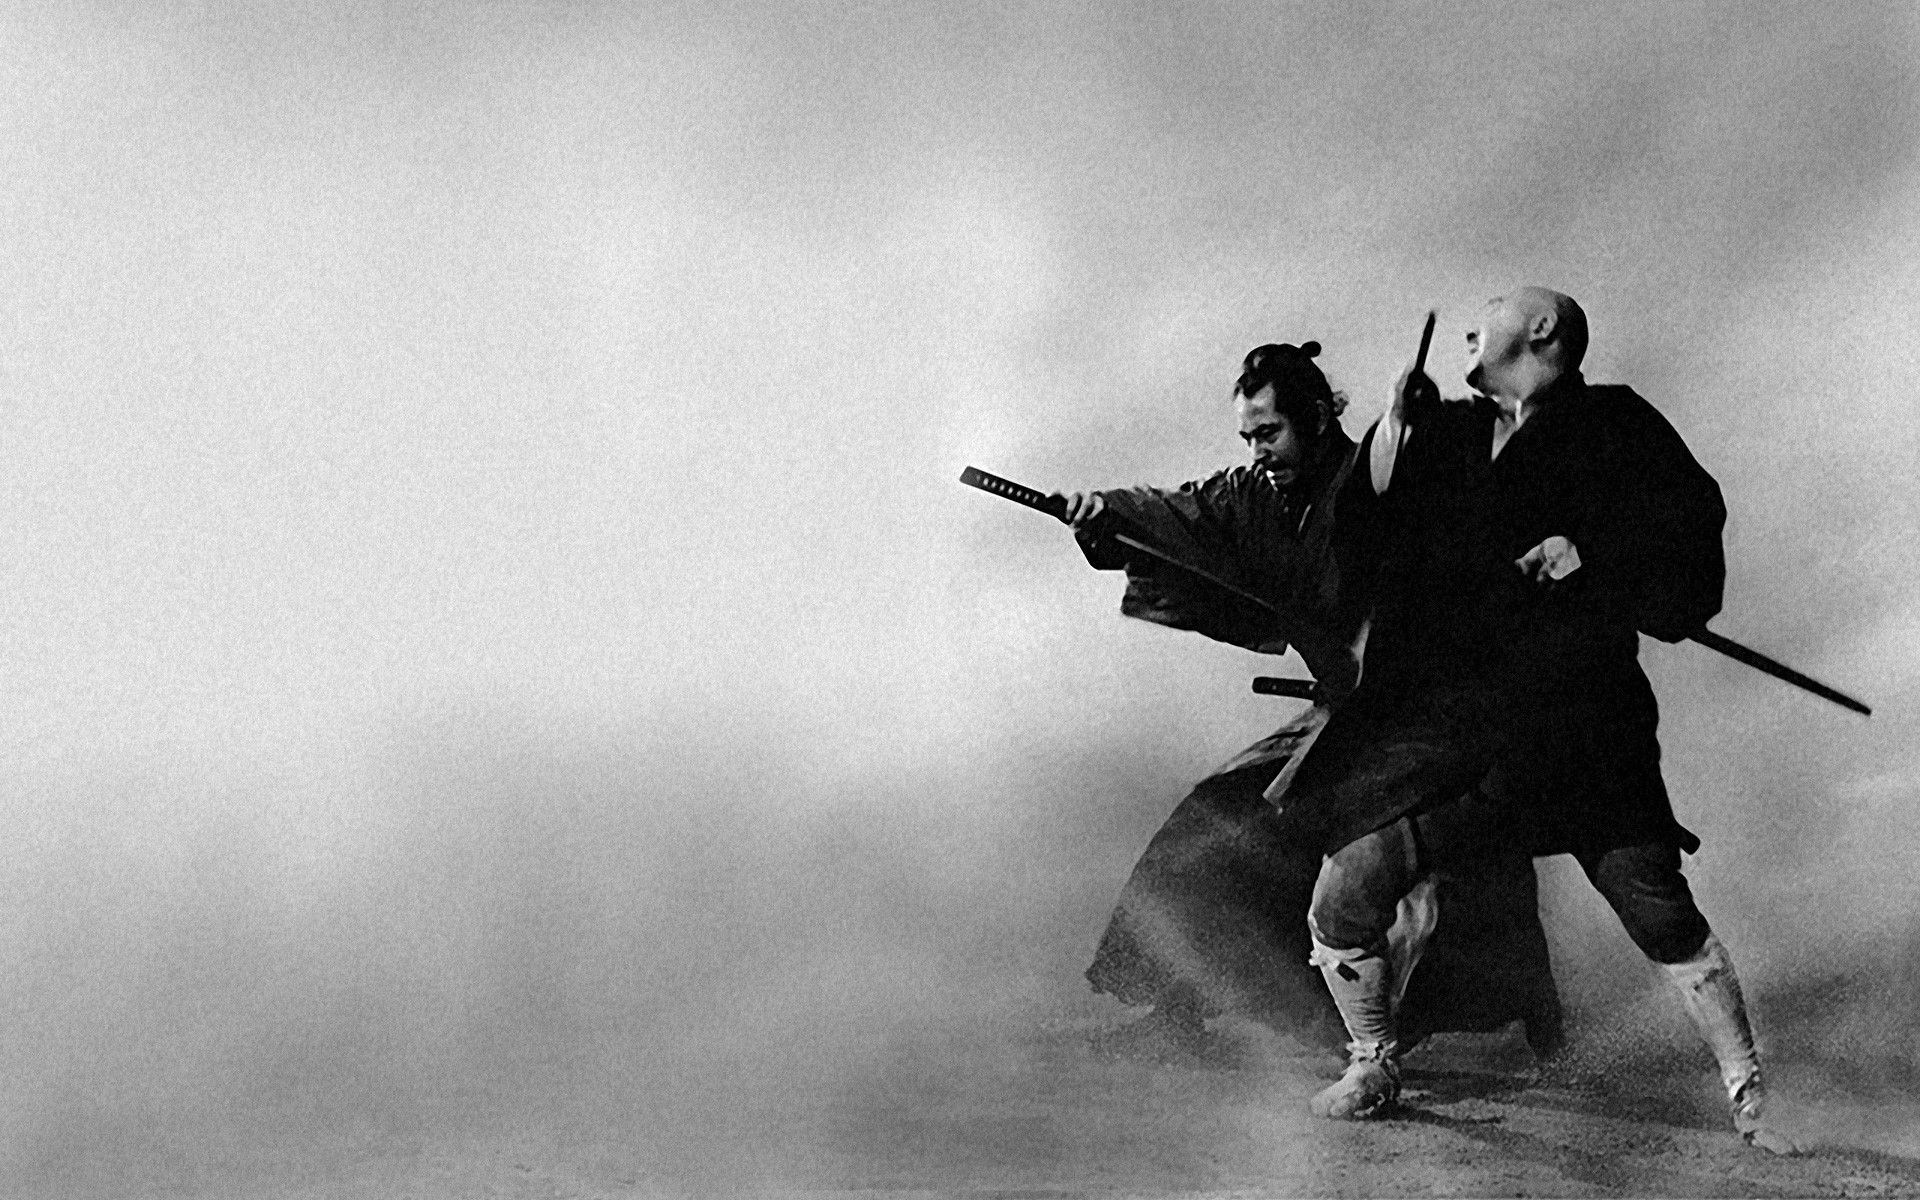 Seven Samurai Wallpaper (60+ images)